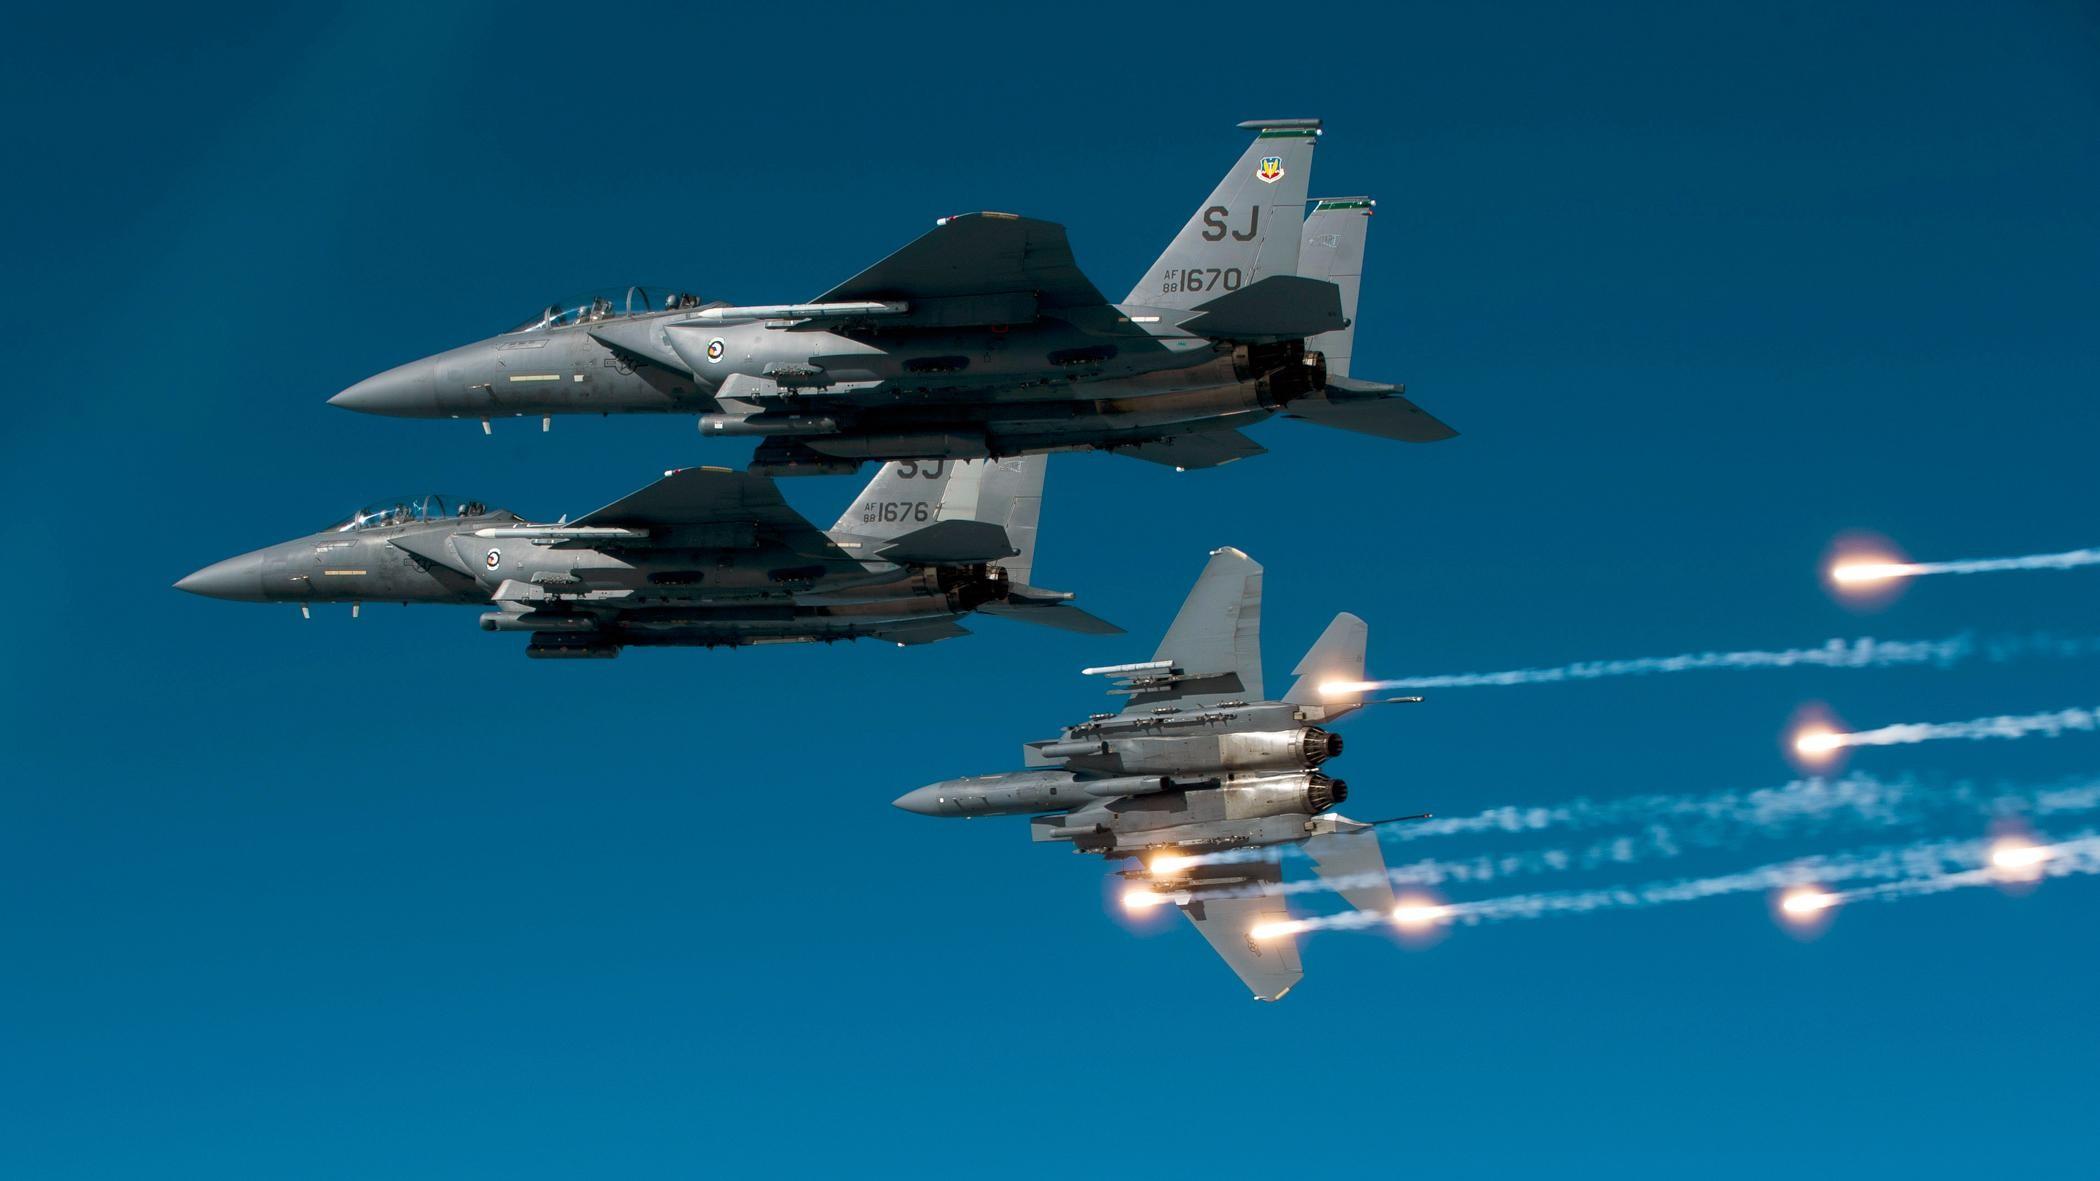 McDonnell Douglas F-15 Eagle Wallpapers HD Download